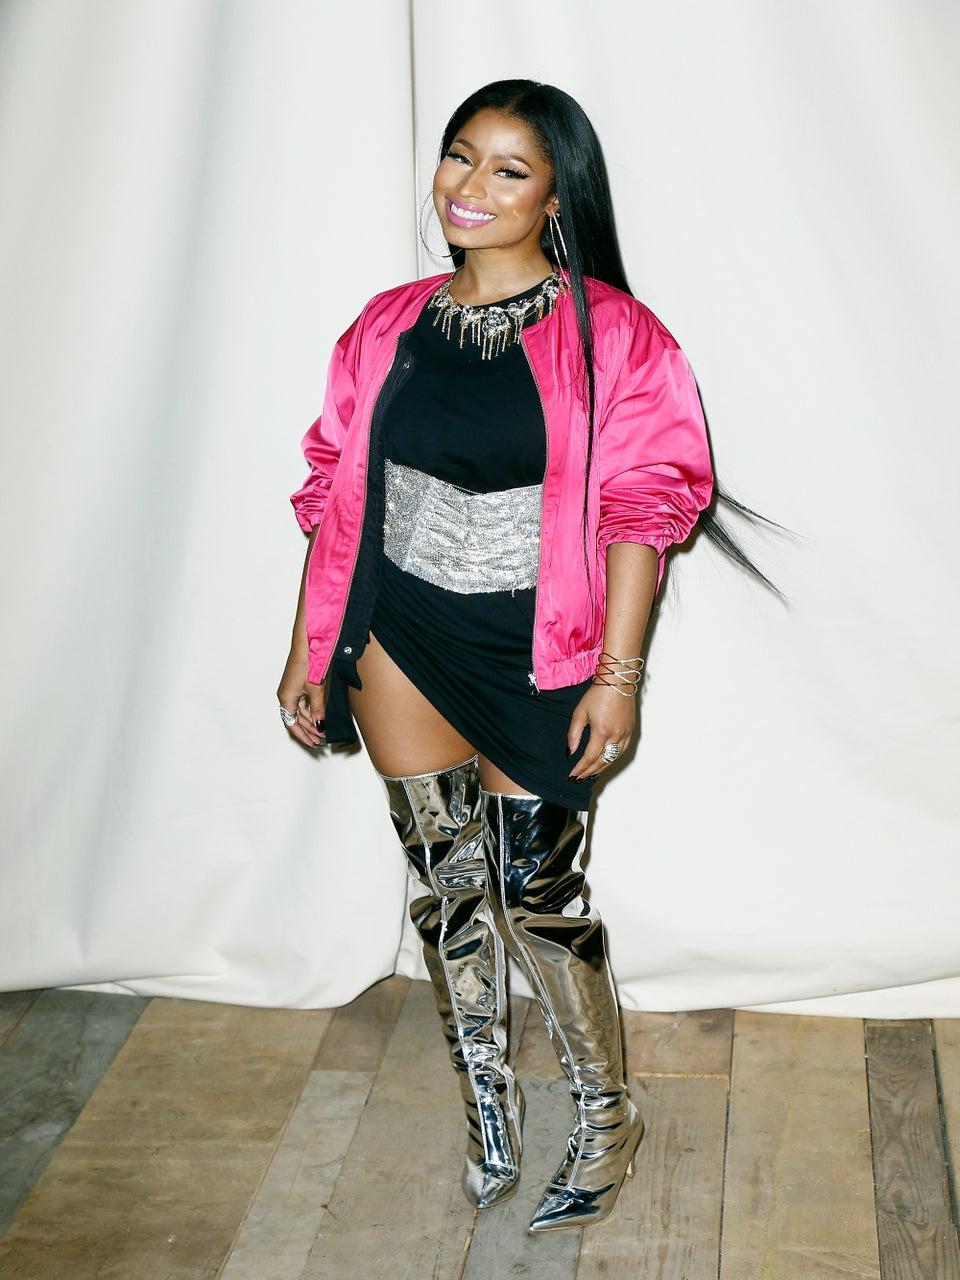 See Nicki Minaj Lip Sync To A Celine Dion Classic